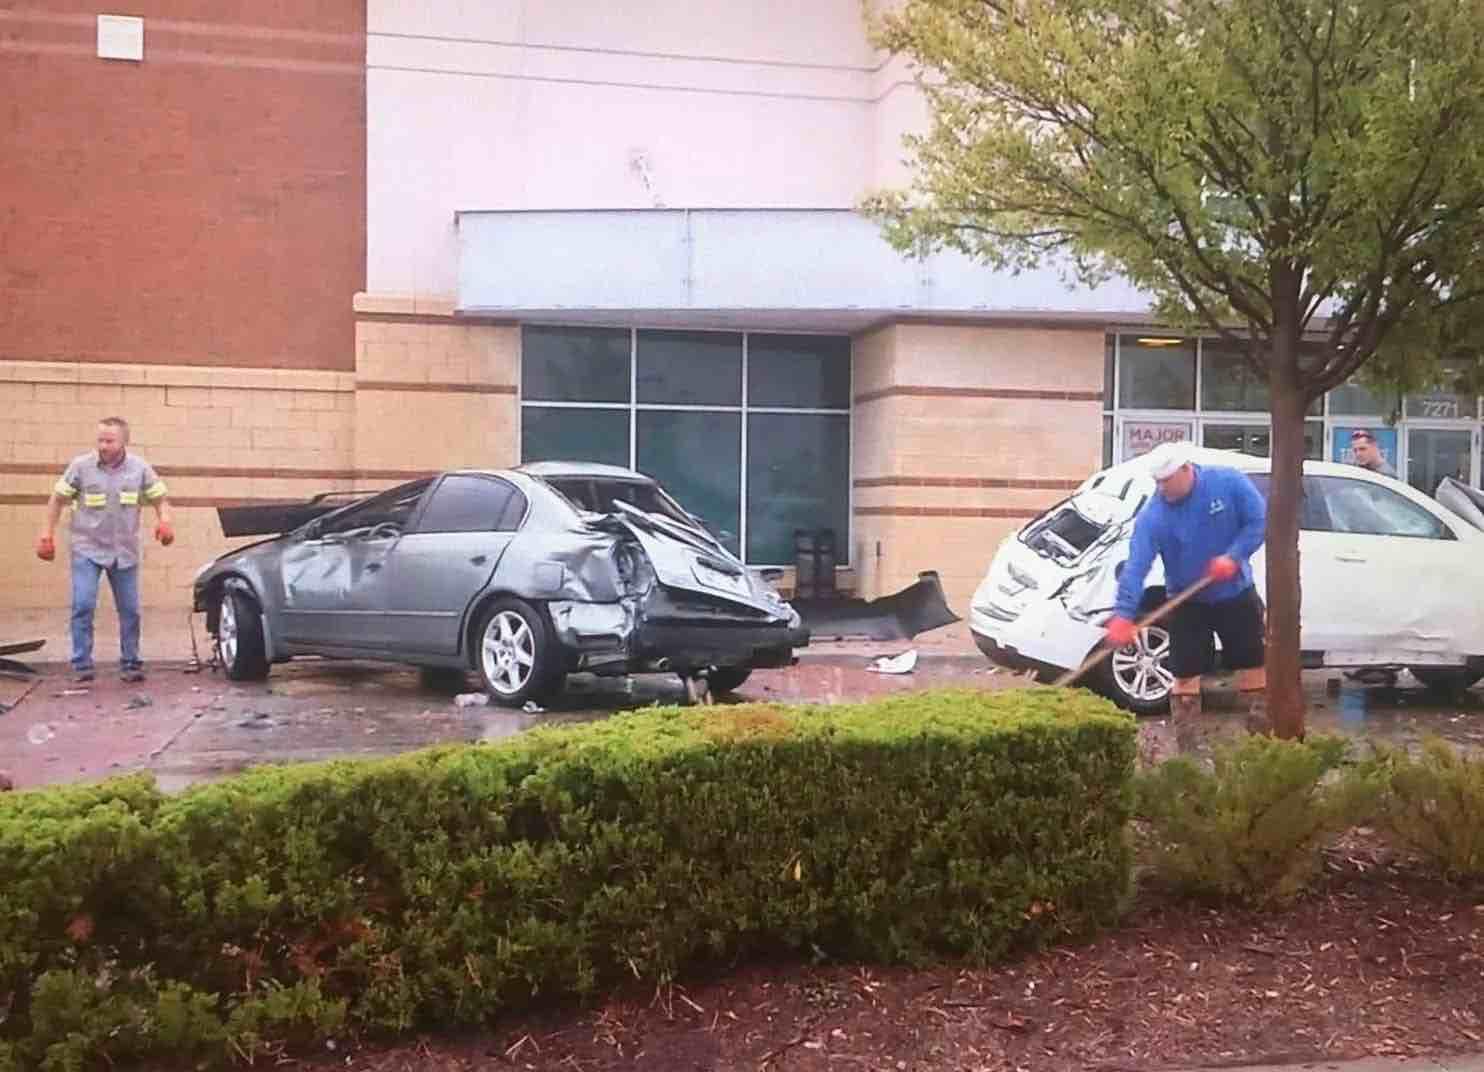 Oklahoma severe weather: Vehicles flip (Photo)